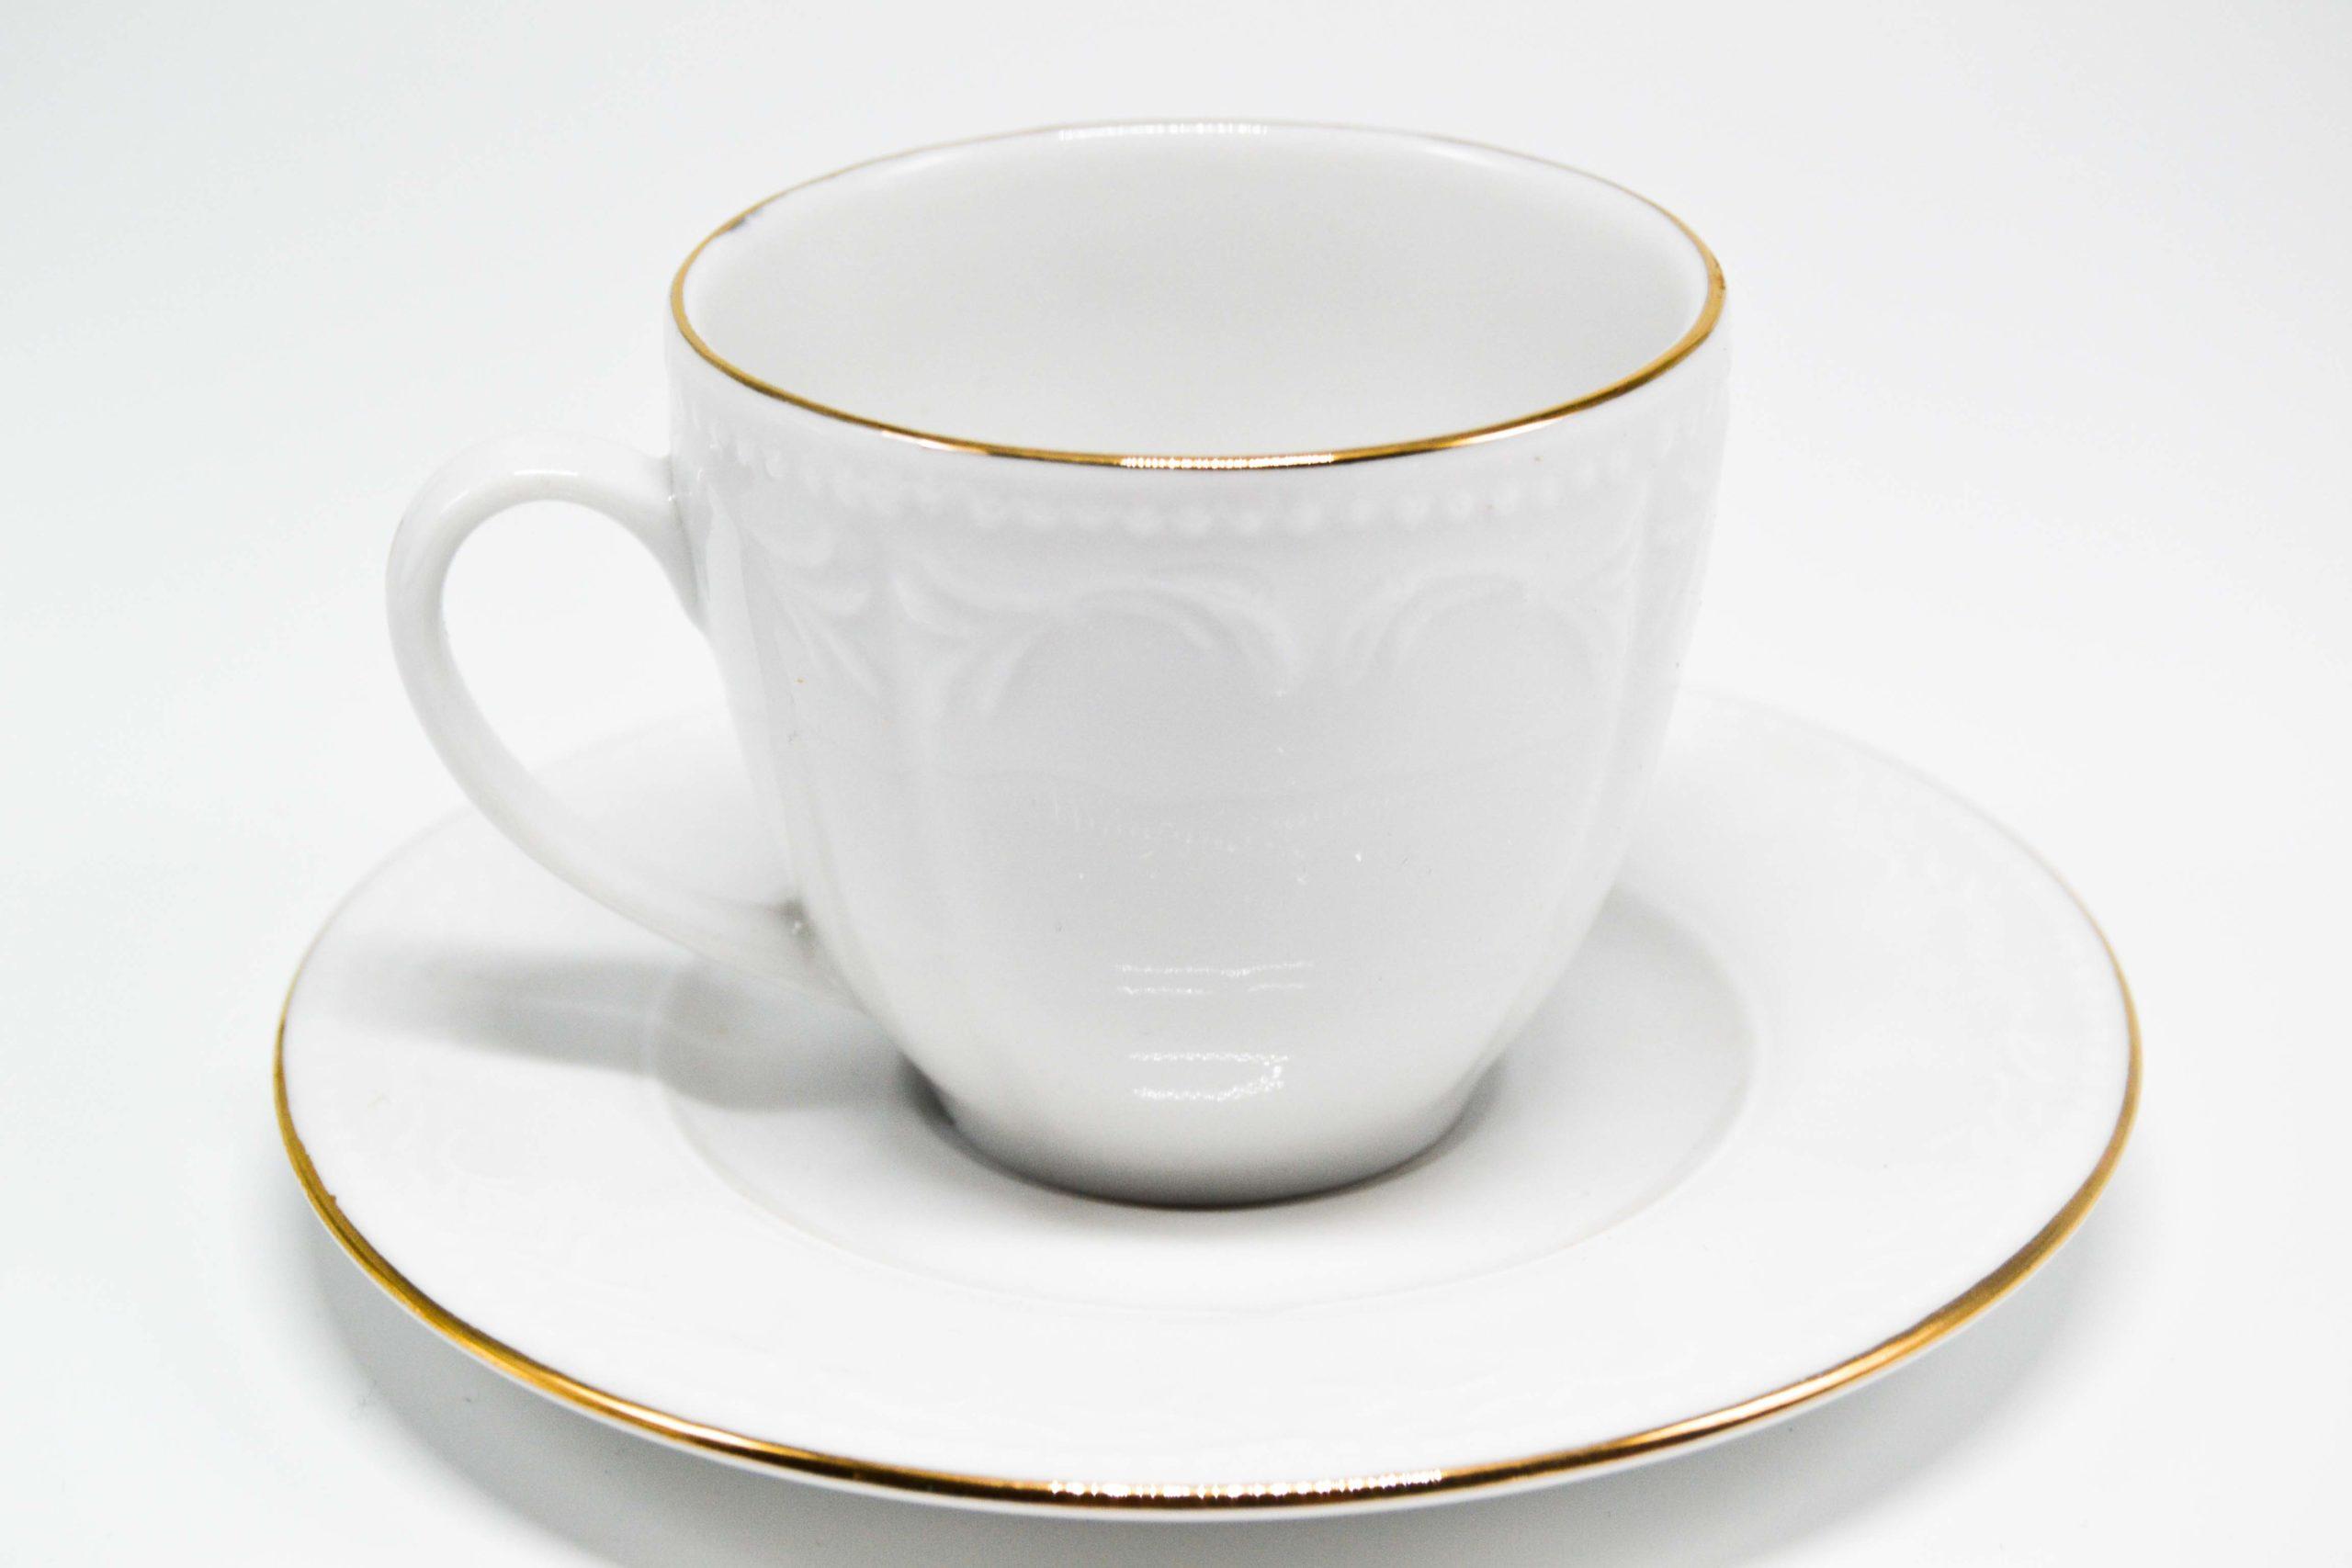 Nazlimshop Damat Fincani Mokkatasse Espresso Kaffeetasse Osmanli Pascha Kahve Mokkaservice0